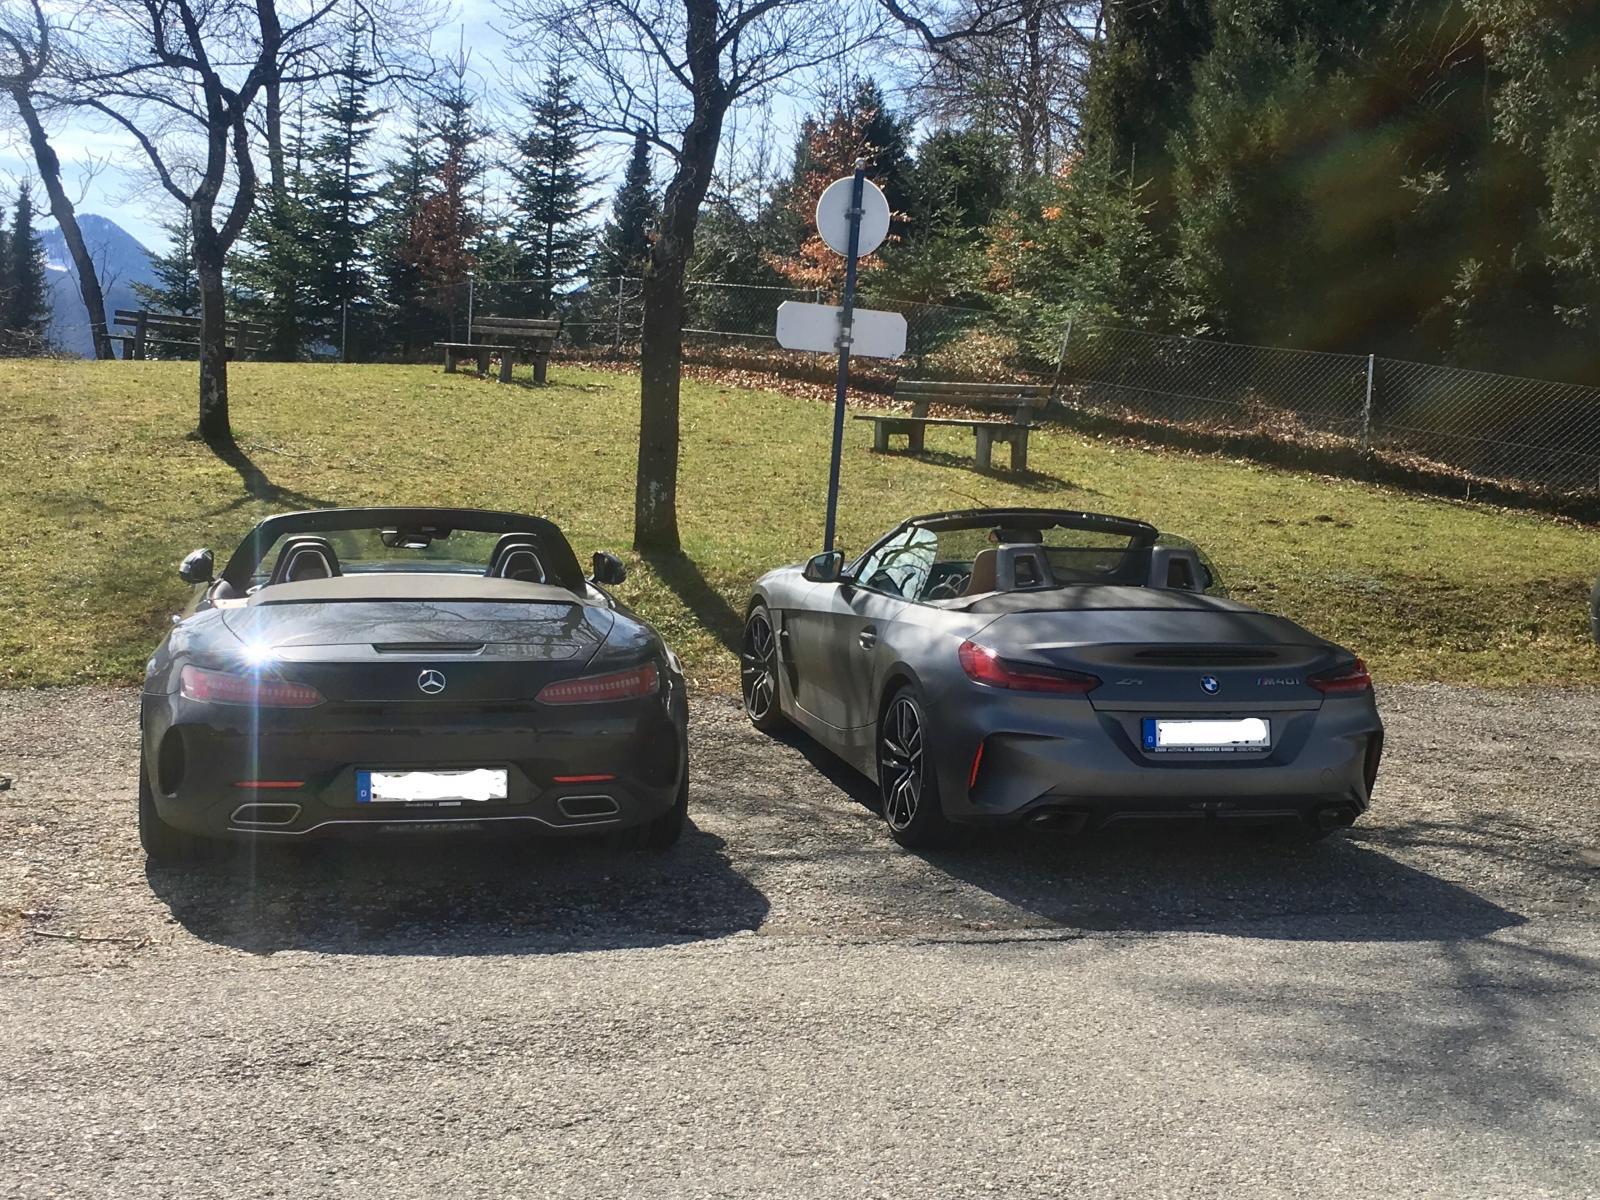 BMW Z4 G29 M40i & AMG GT-C Roadster